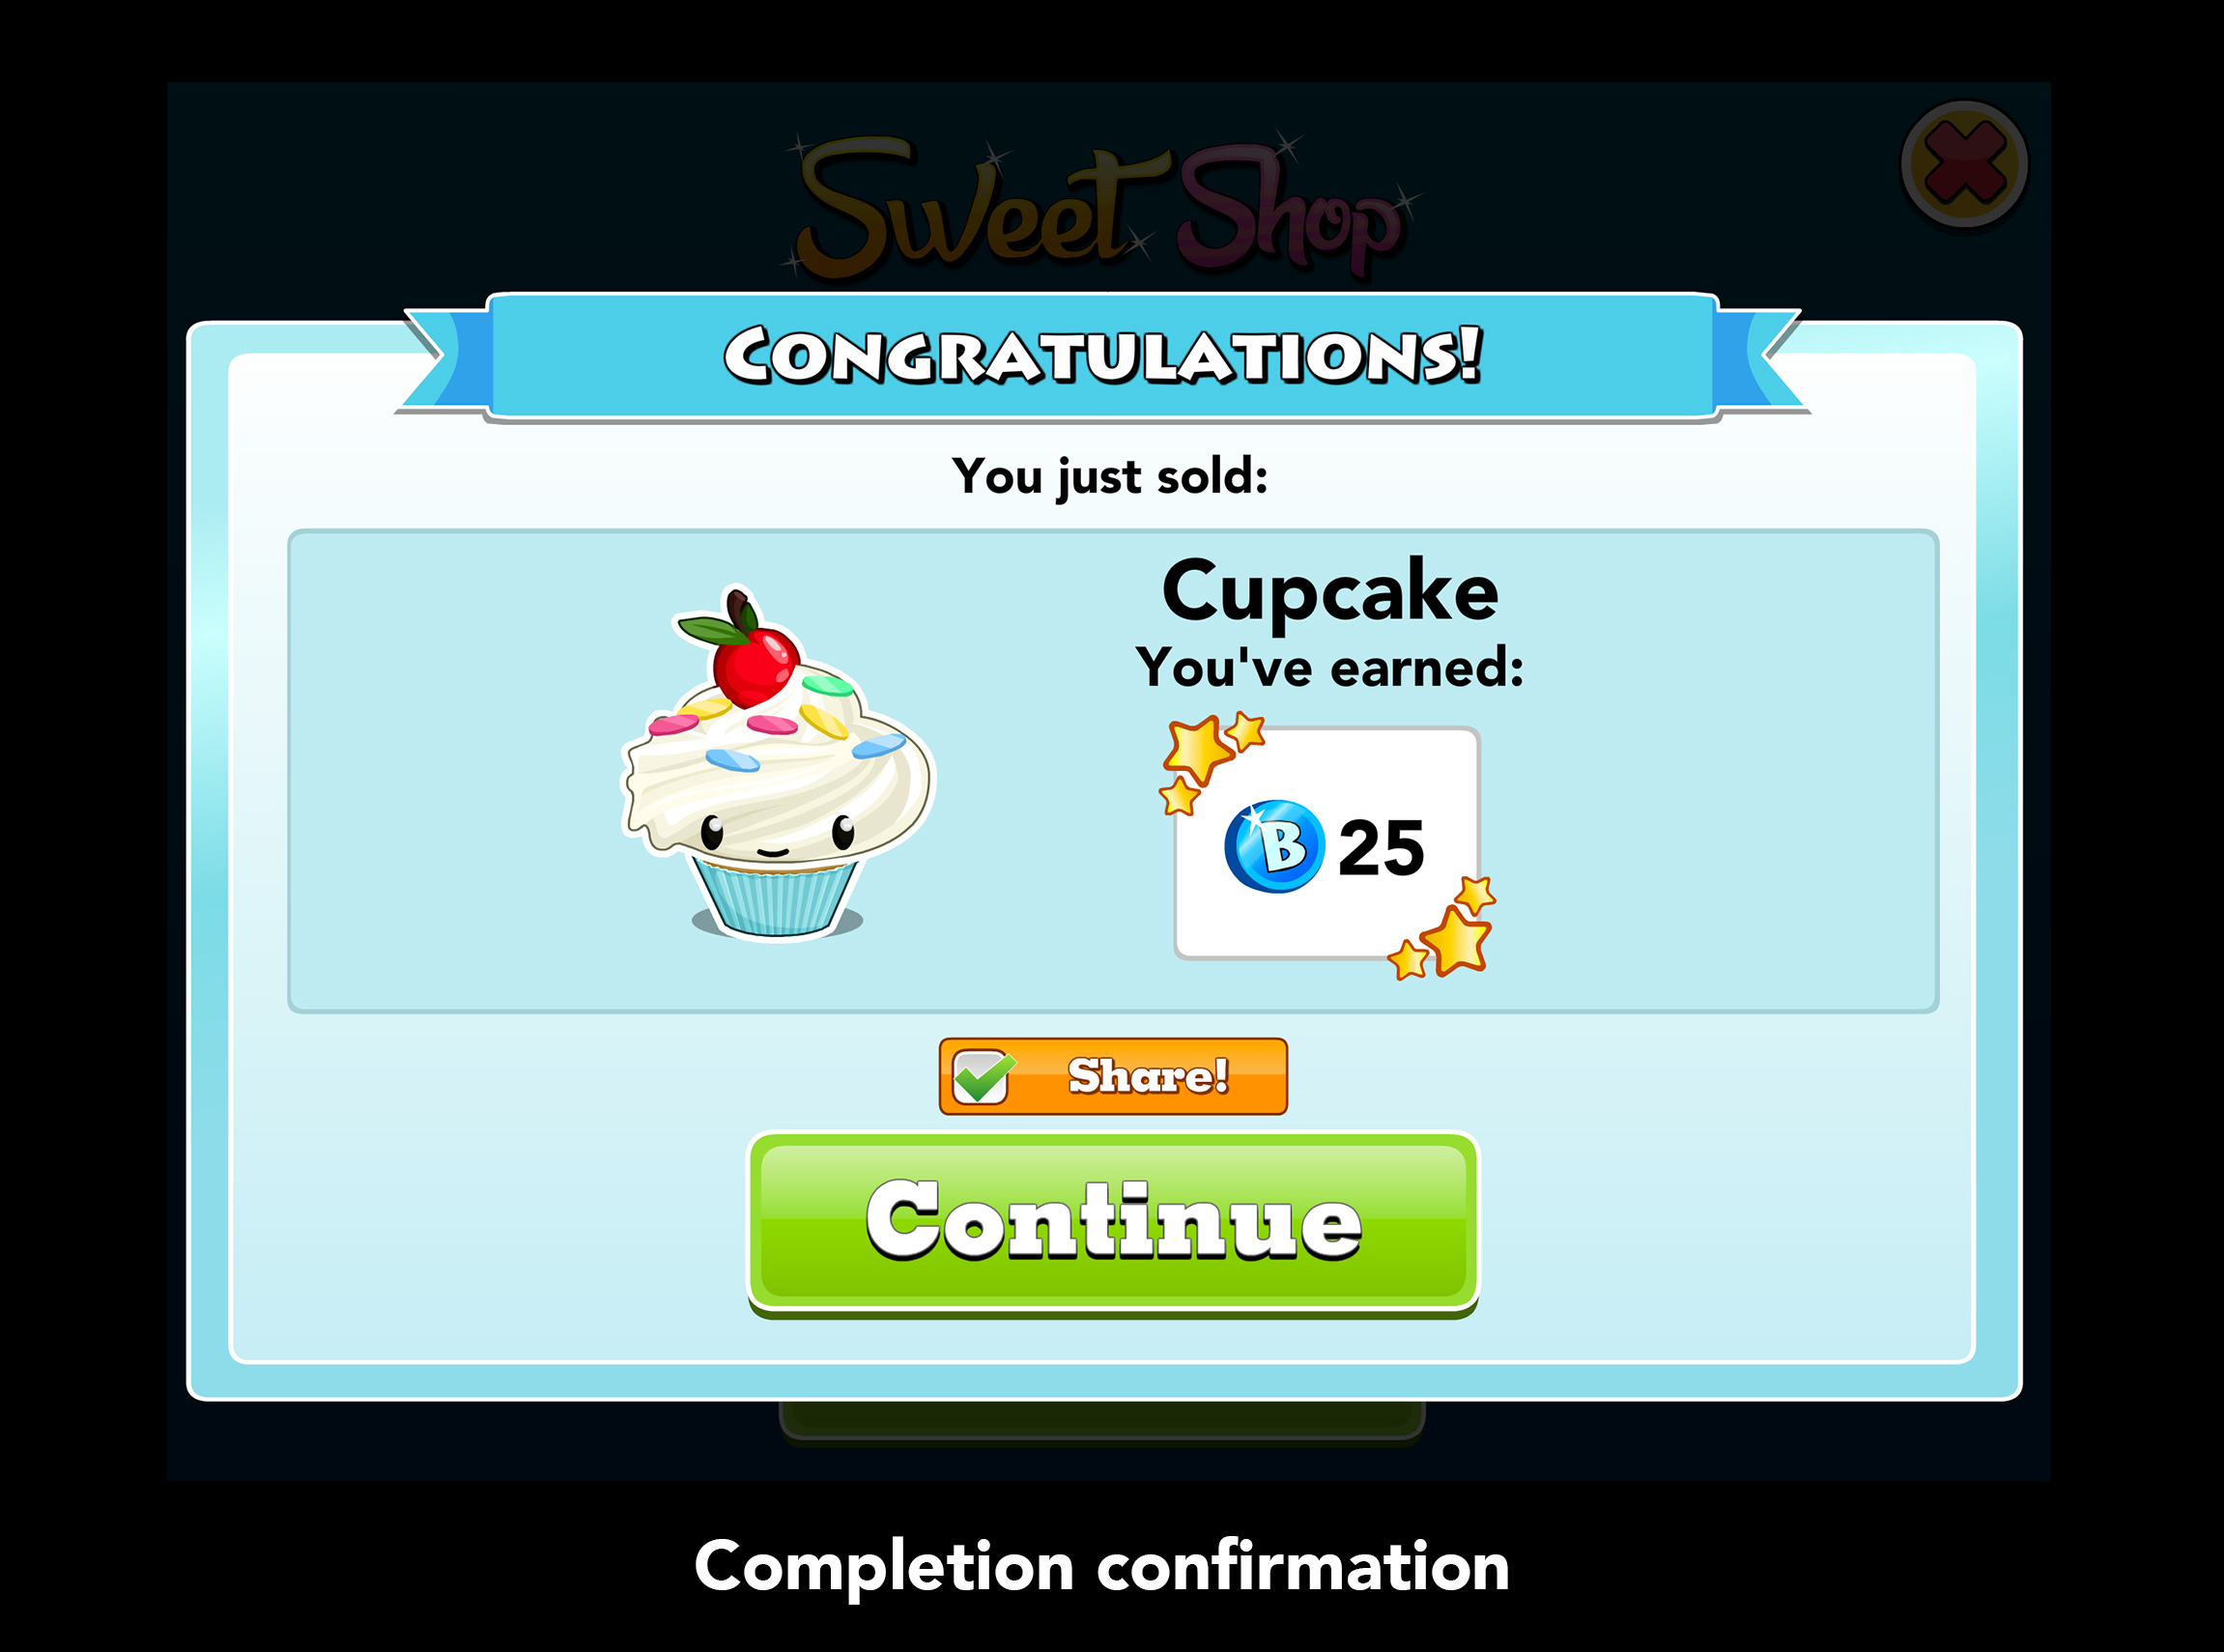 SweetShop_CompletionConfirmation.jpg